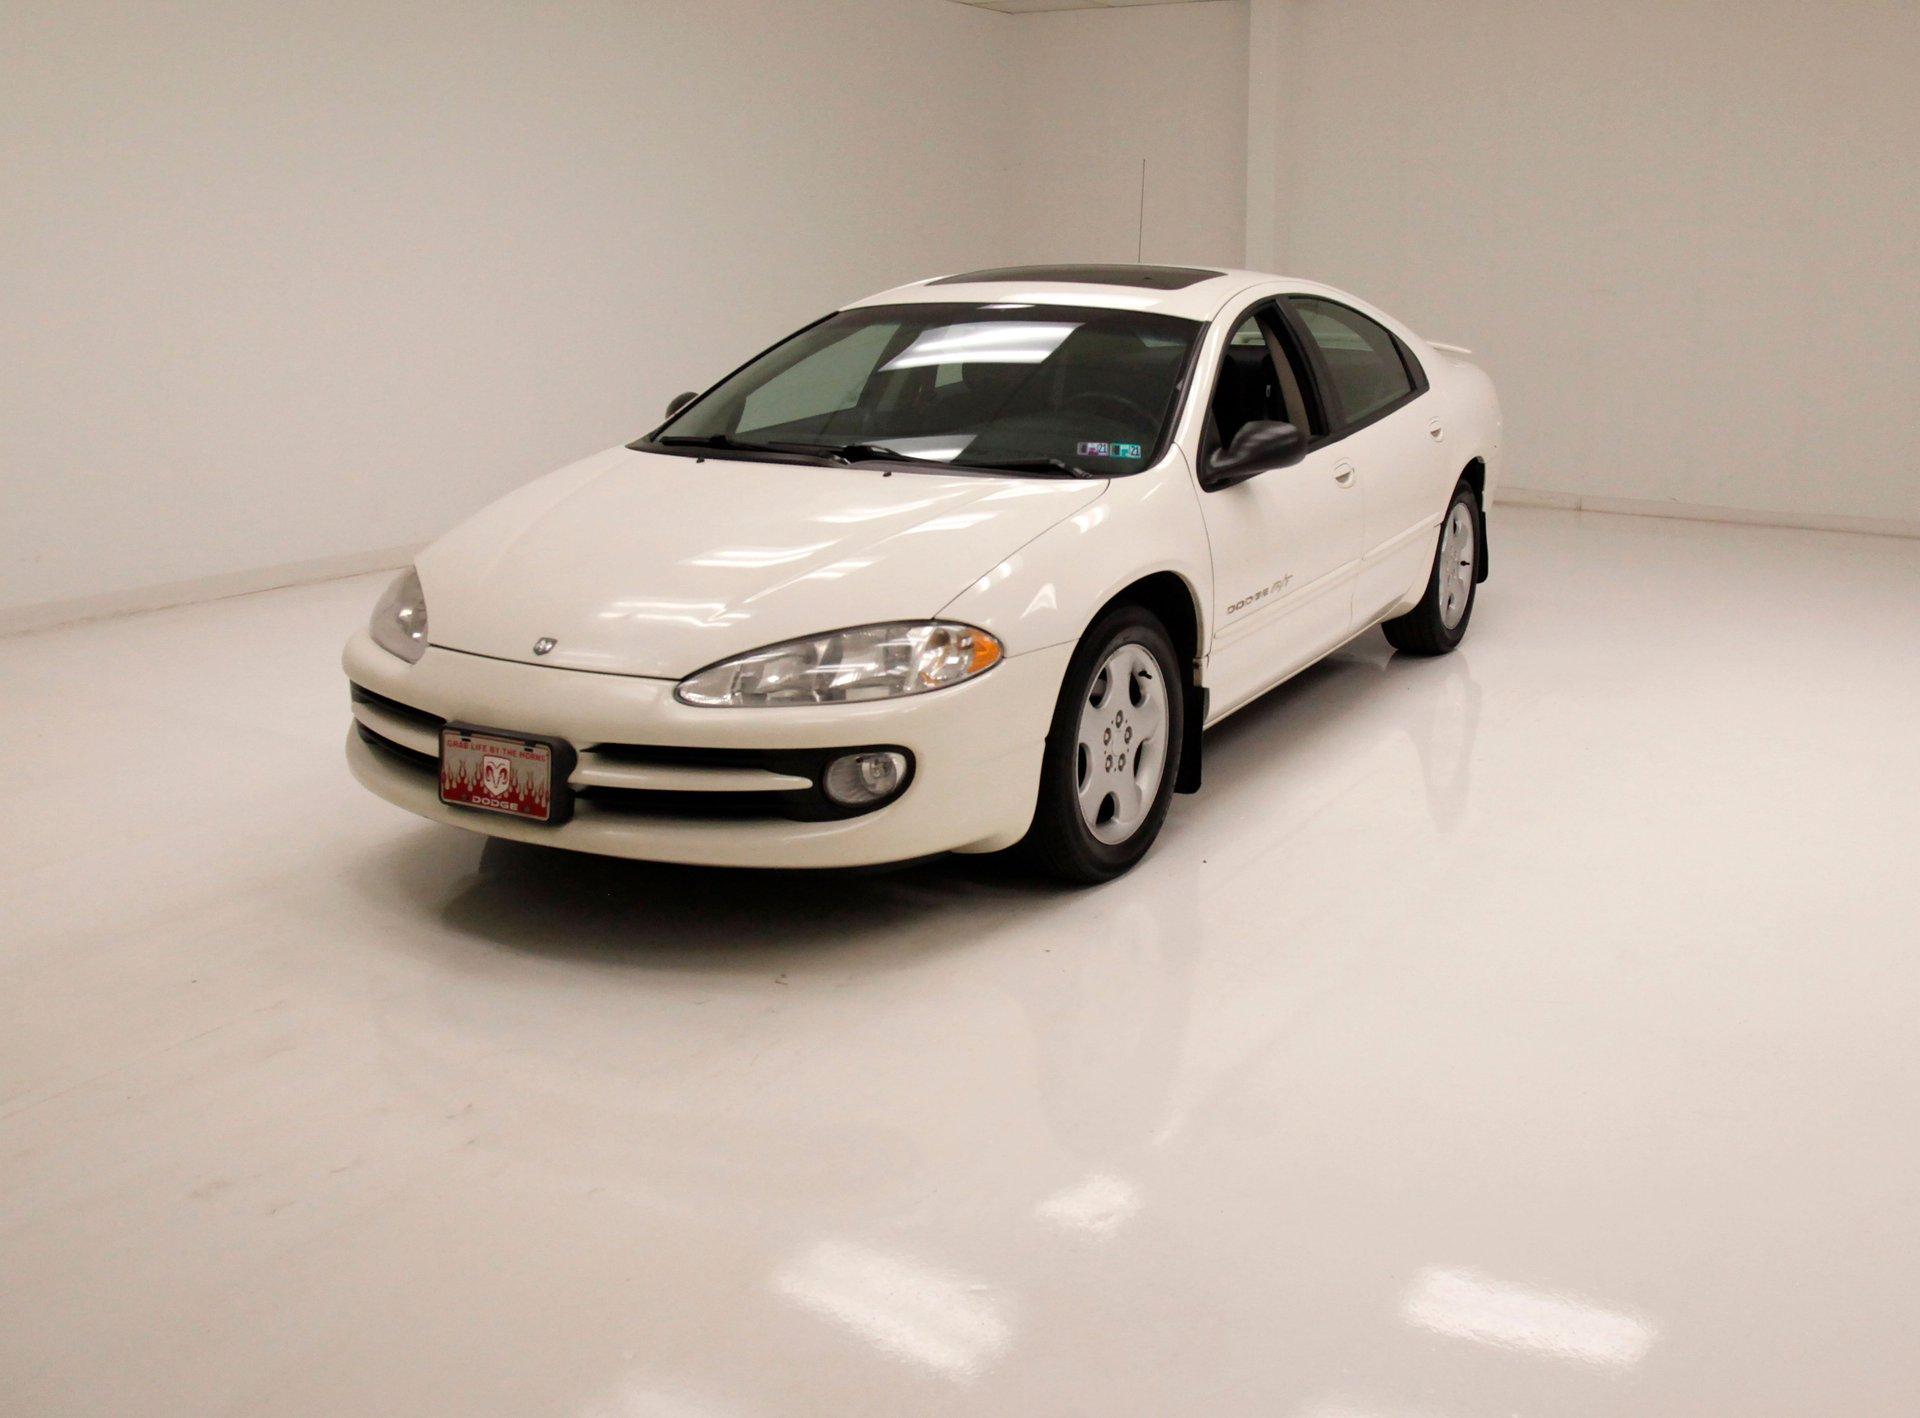 2000 Dodge Intrepid RT